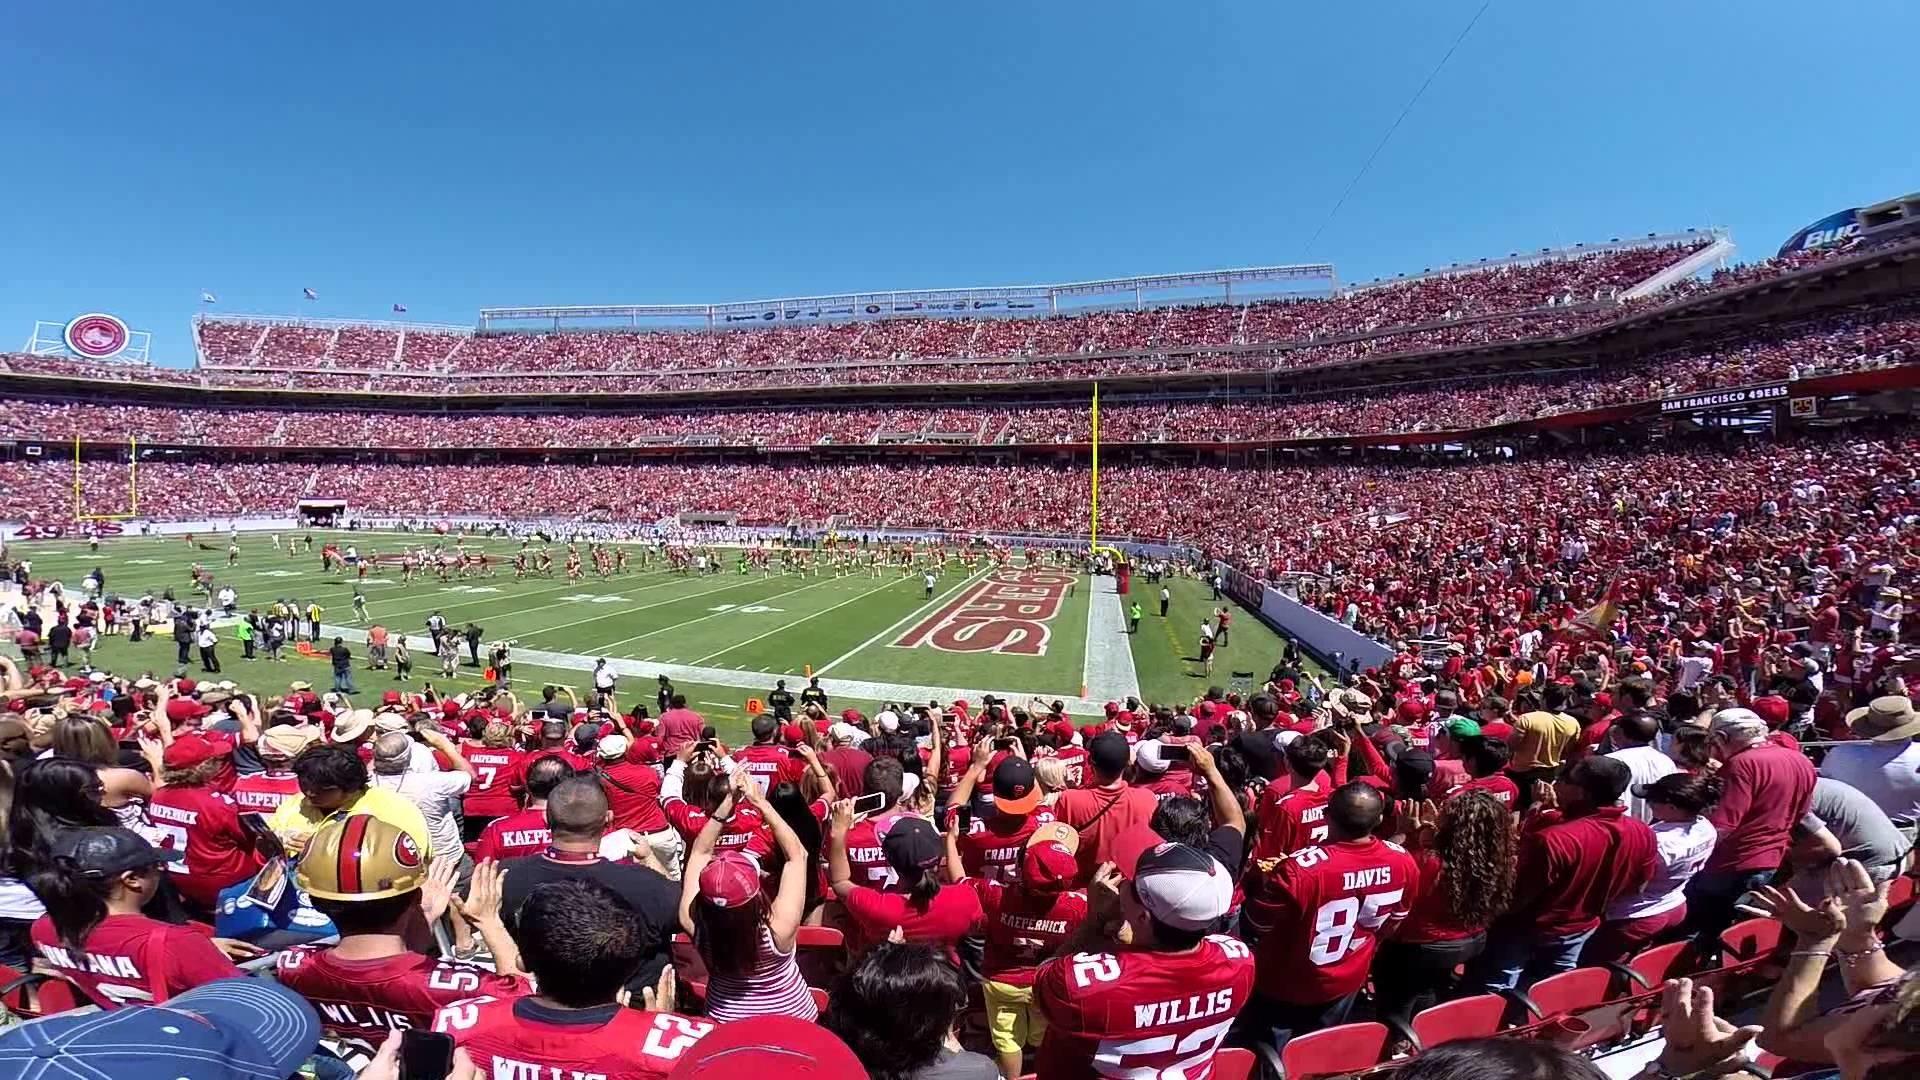 Levi Stadium @ 49ers first home pre-season game vs Broncos, 8-2014